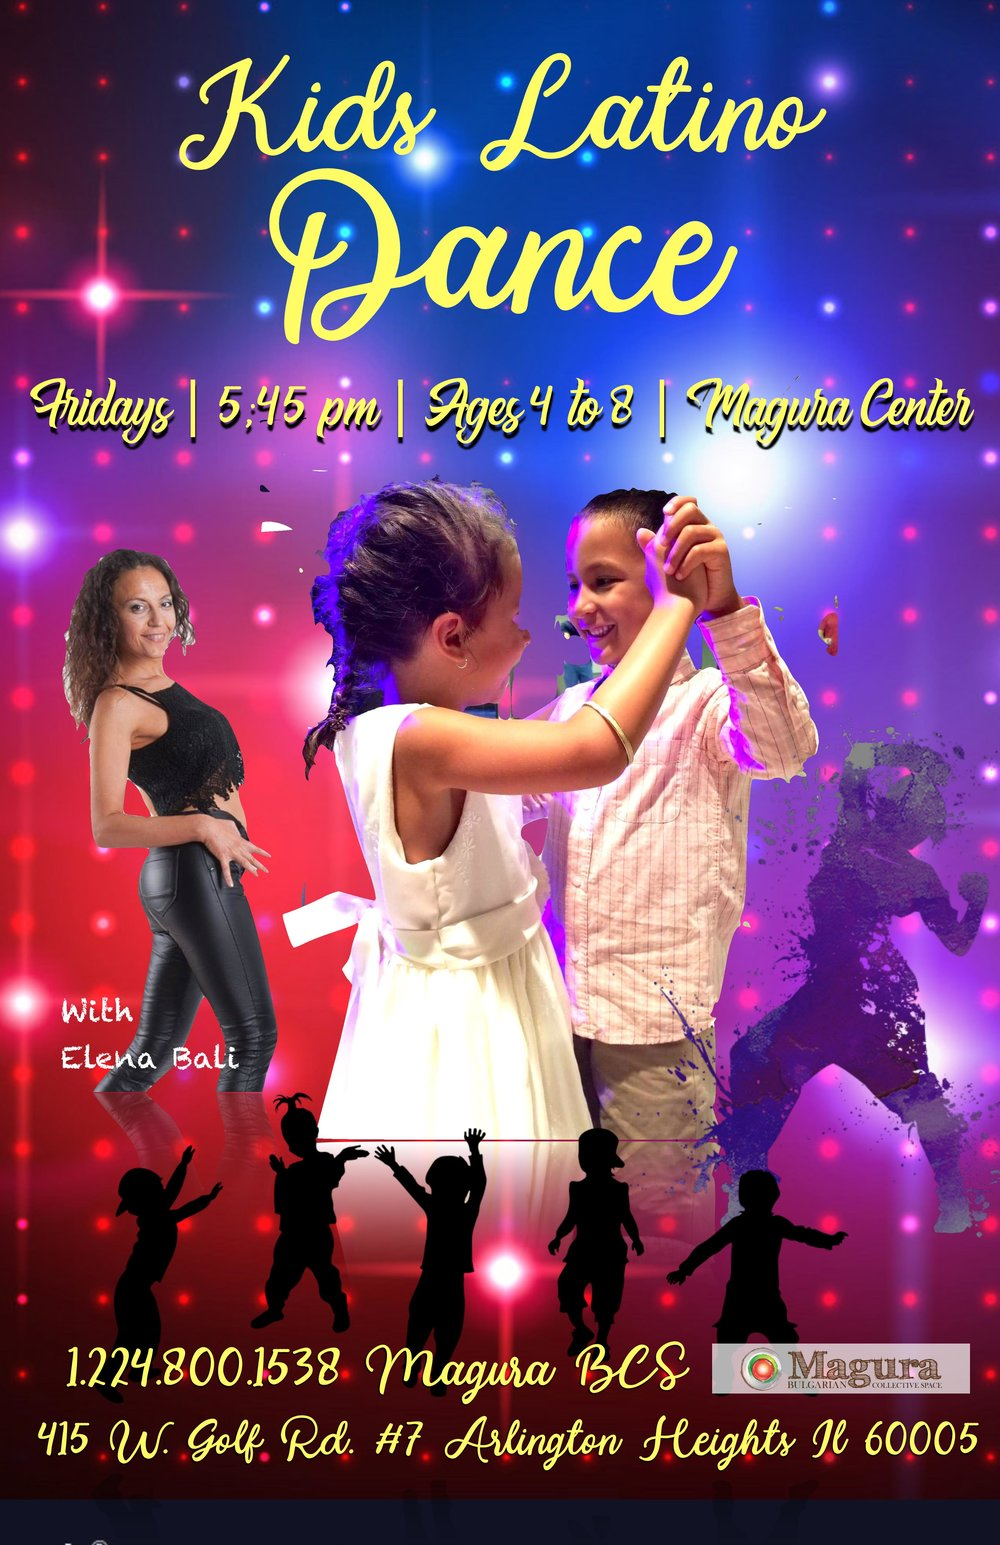 Kids Latino Dance Final test -page-001.jpg